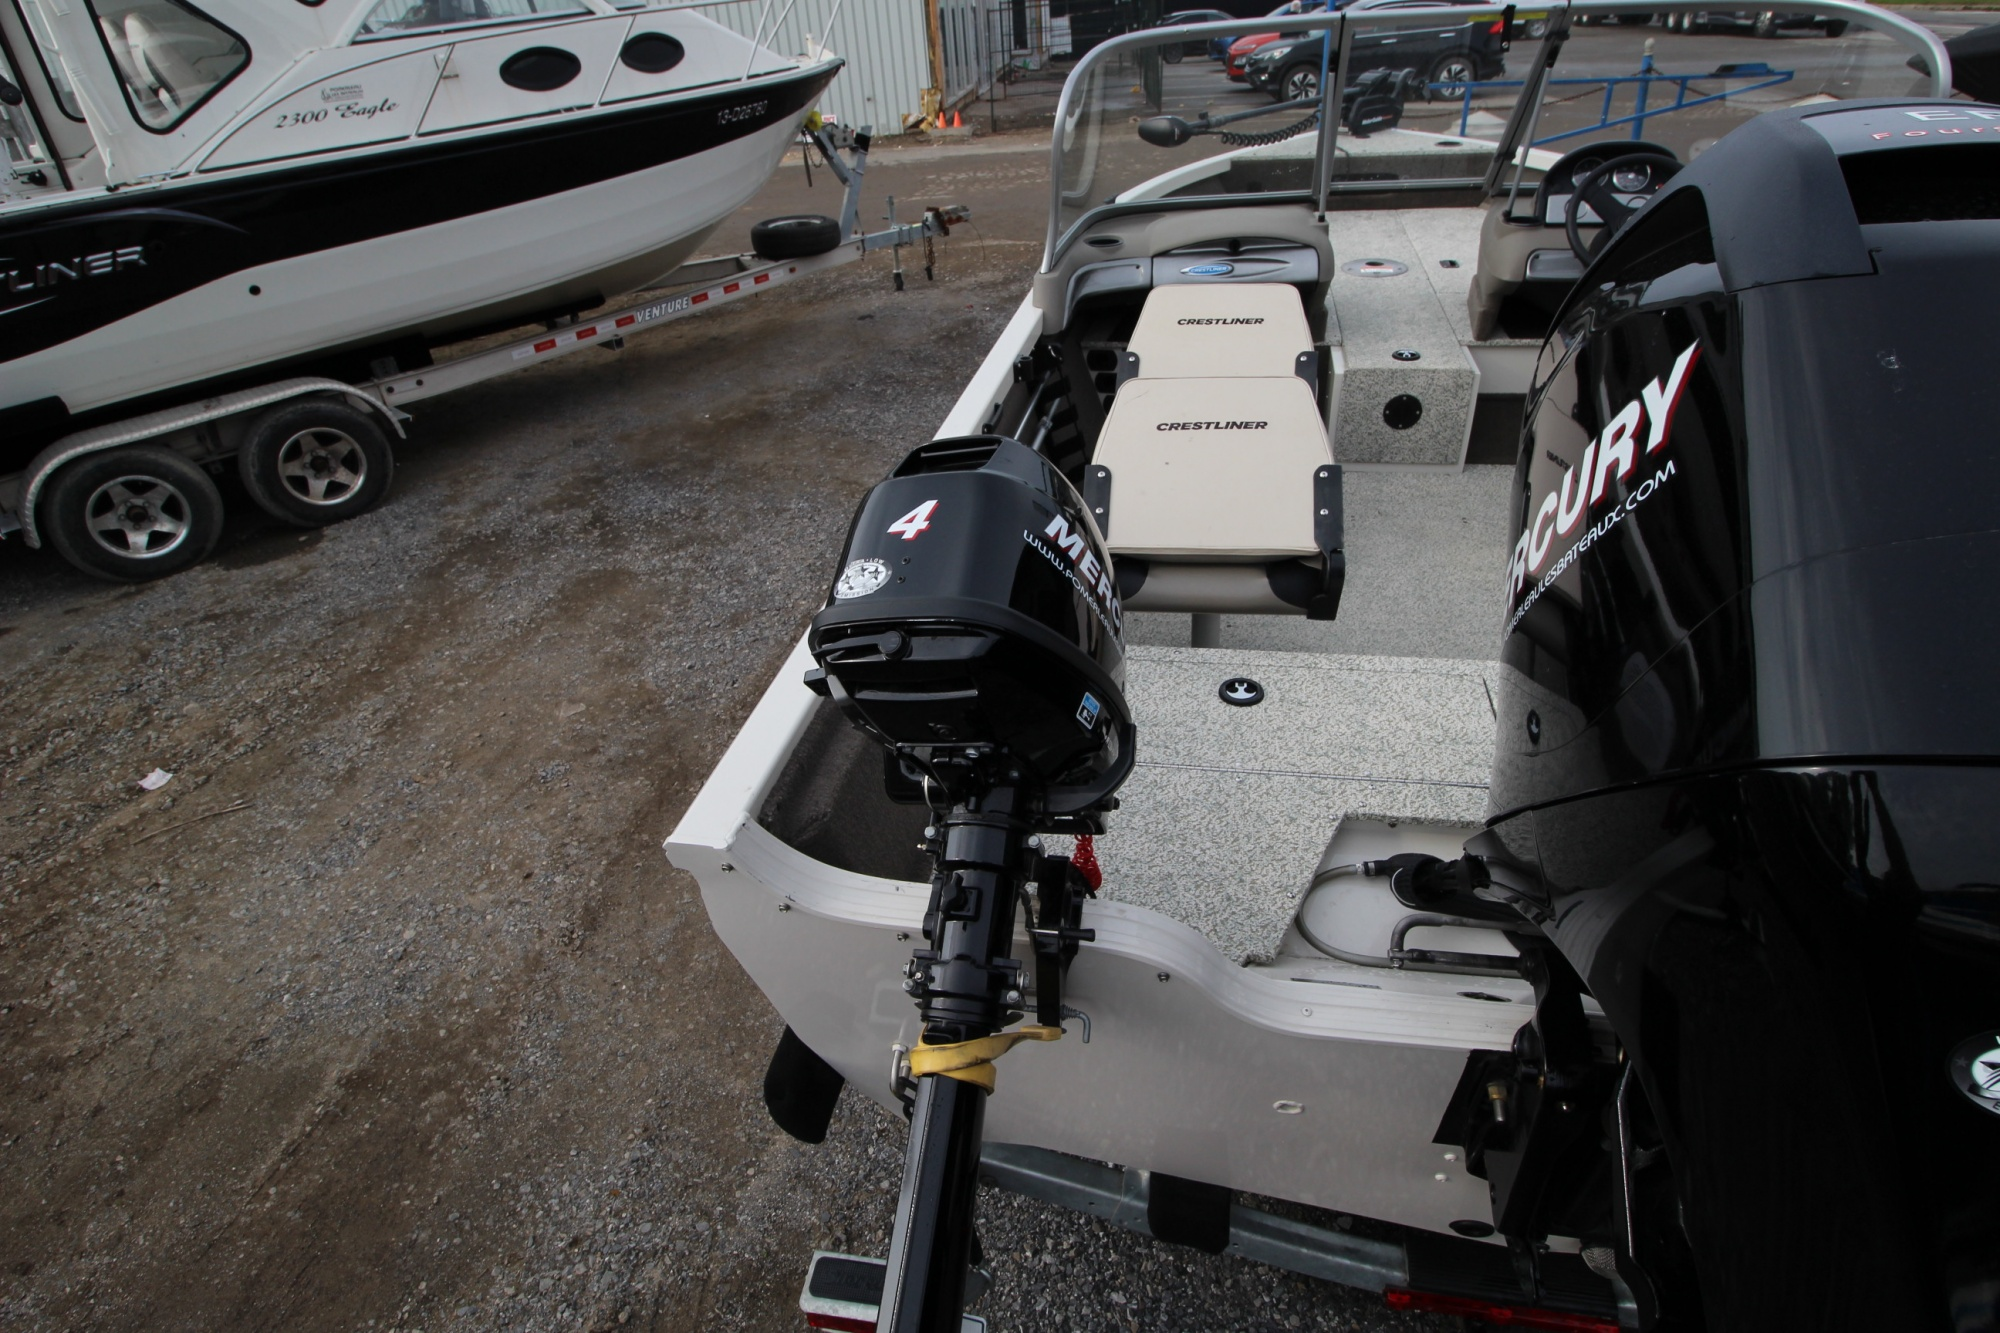 CRESLINER 1650 FISH HAWK - IMG_0107